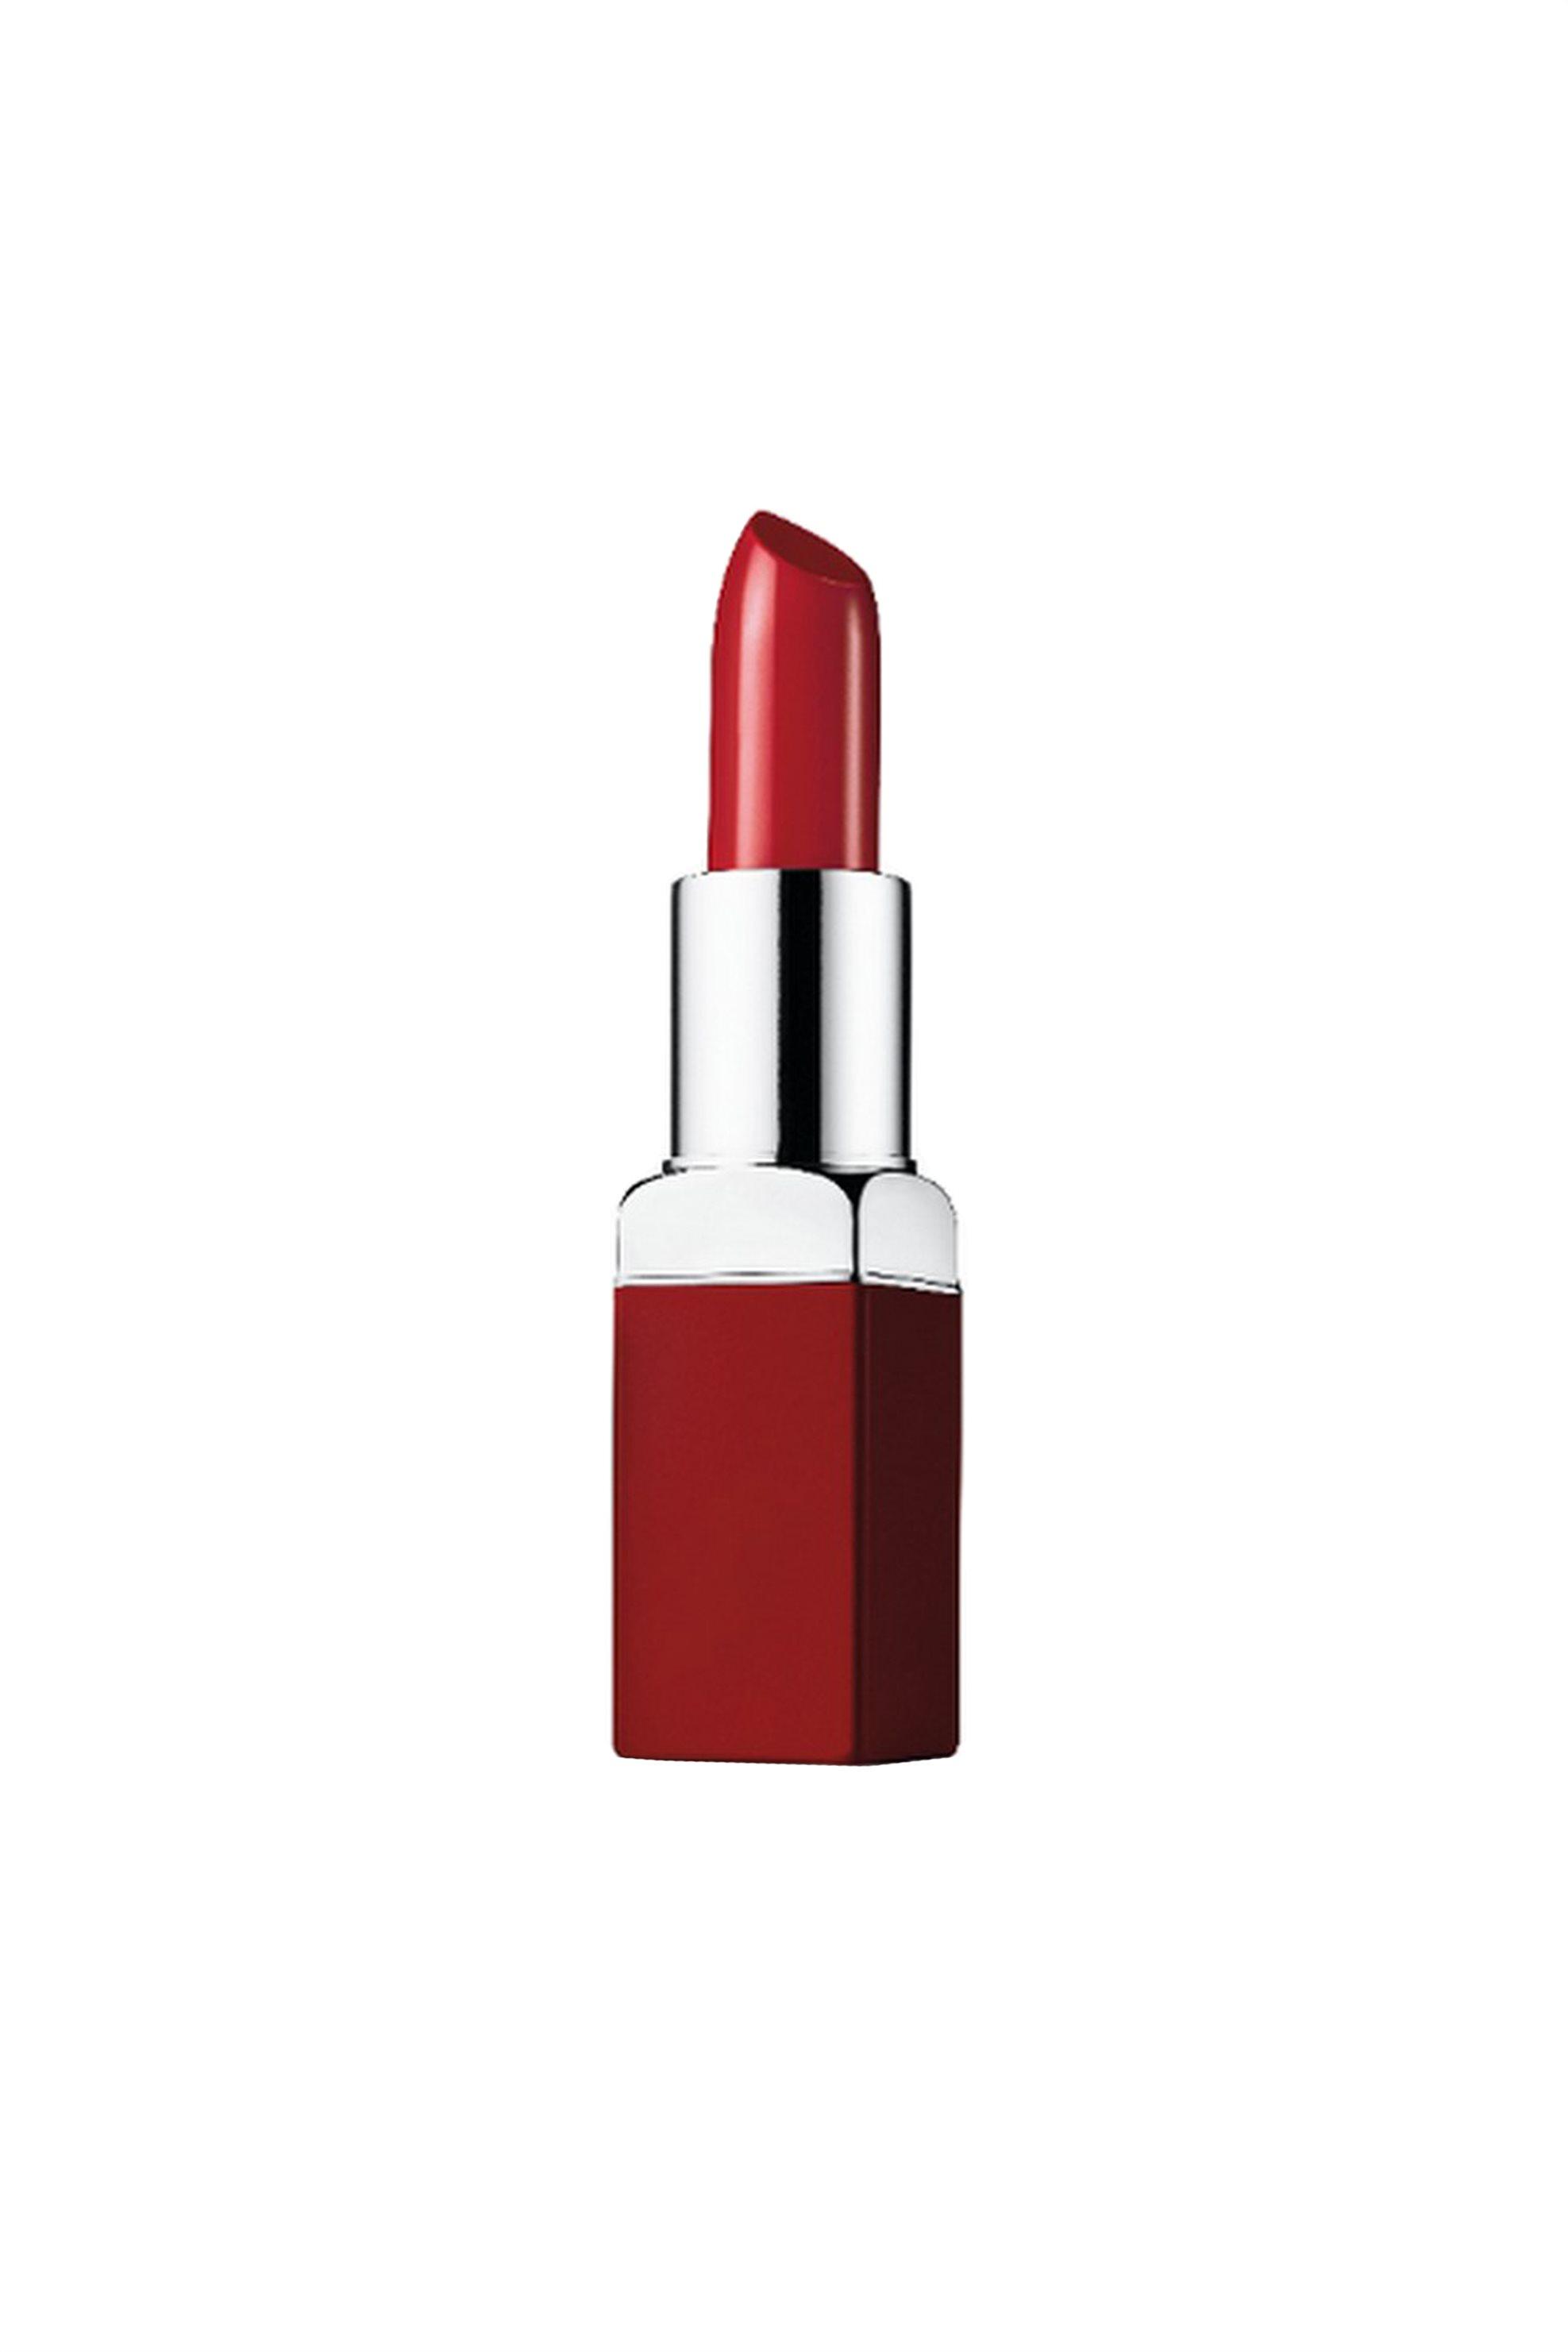 Clinique Pop™ Lip Colour + Primer Travel Size 07 Passion Pop 2.3 gr. - ZMWA07000 ομορφια   καλλυντικα επιλεκτικησ   μακιγιάζ   χείλη   κραγιόν